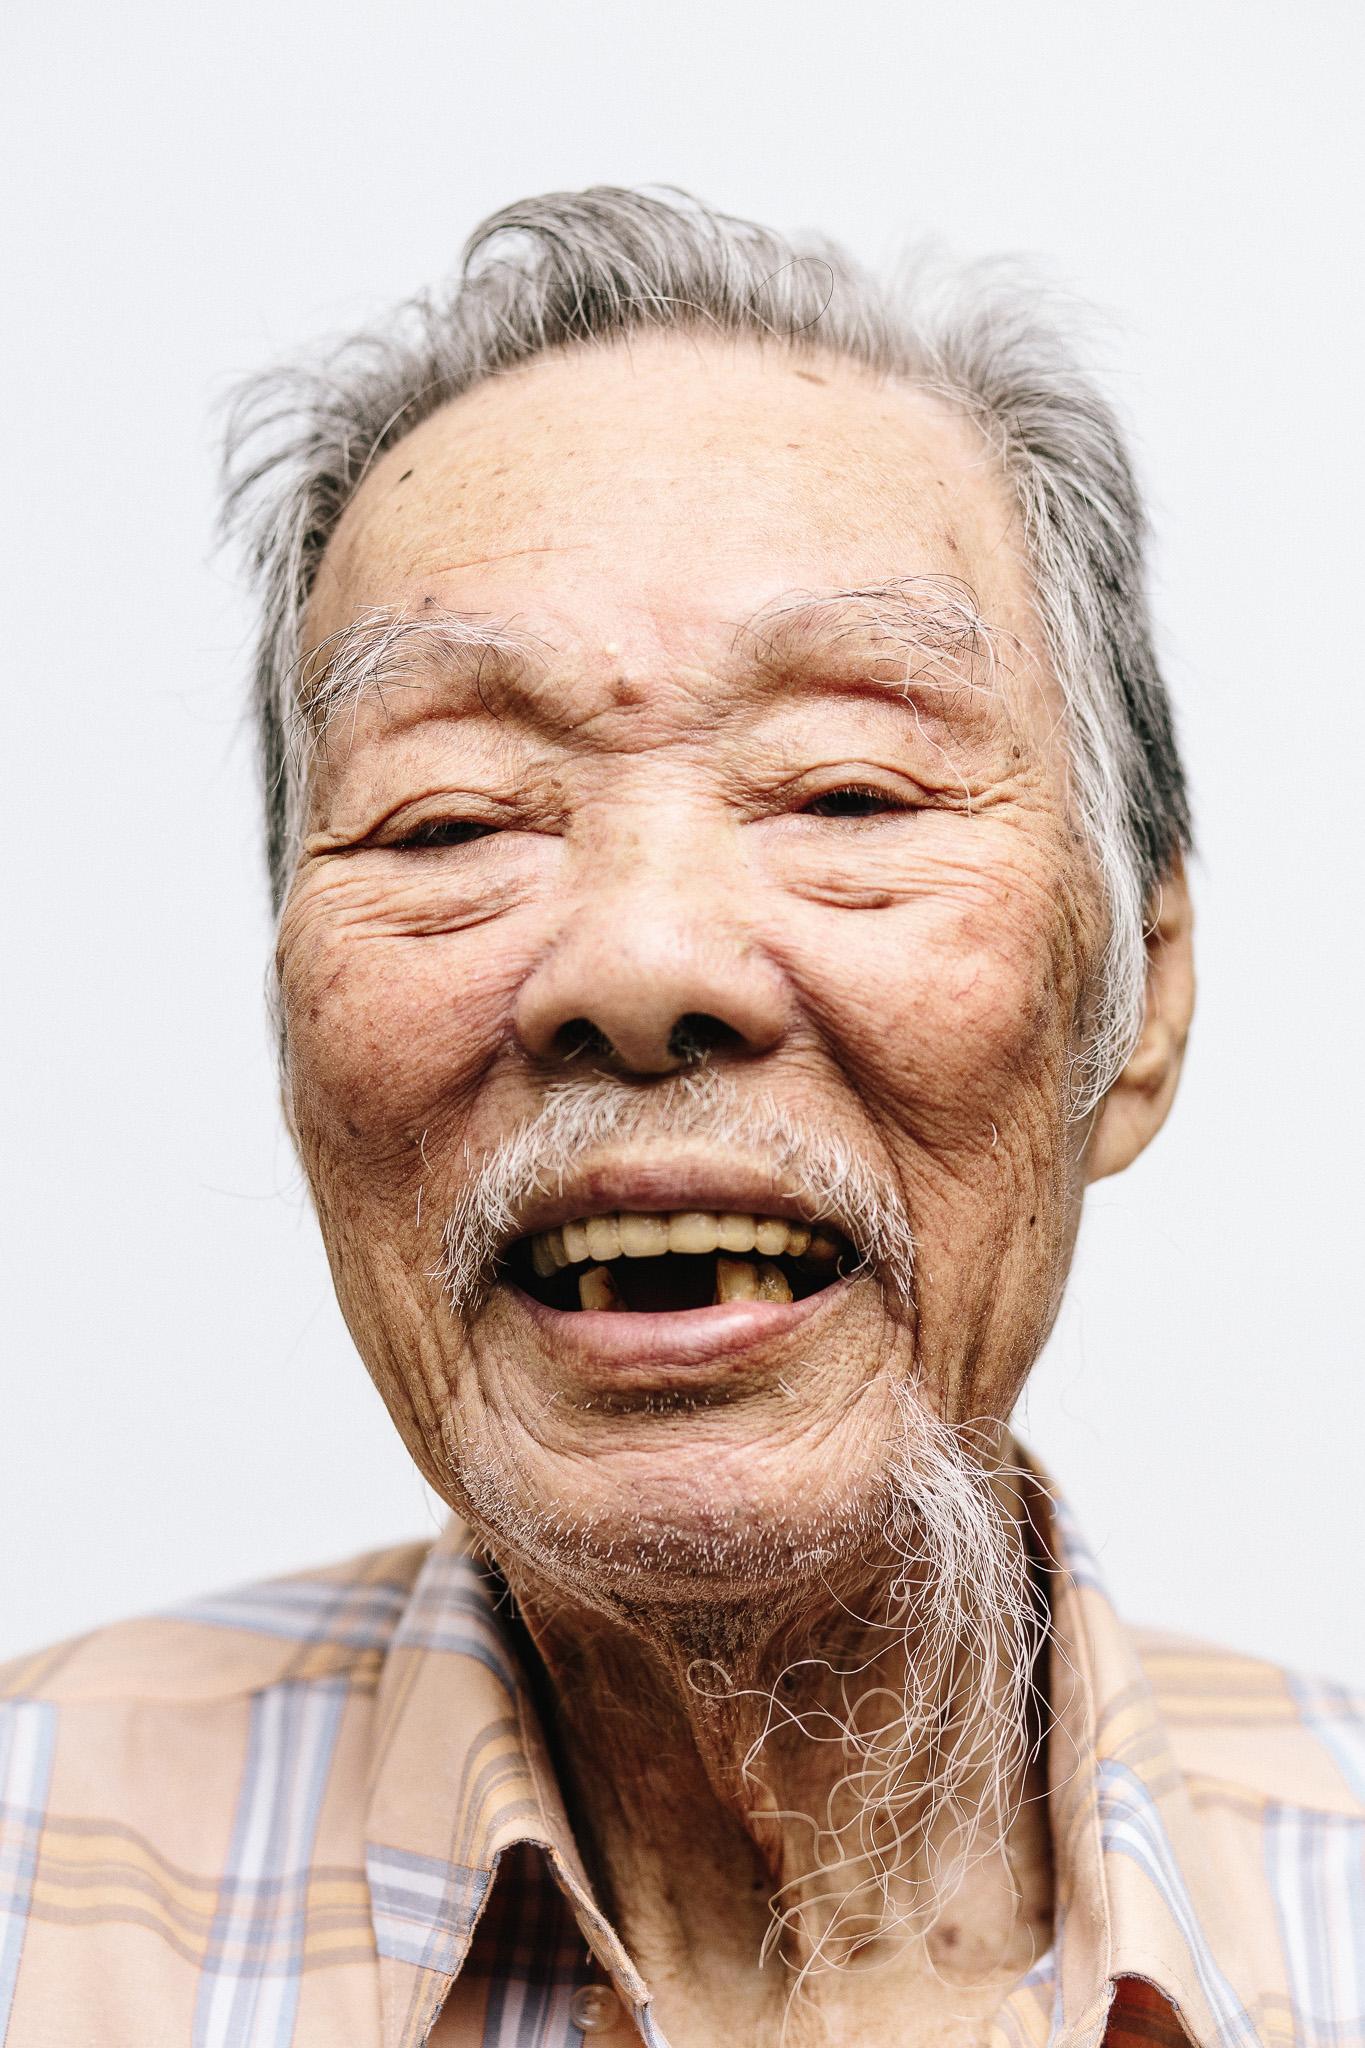 zainal-zainal-studio-centenarians-care-duke-nus-singapore-photographer-05.jpg